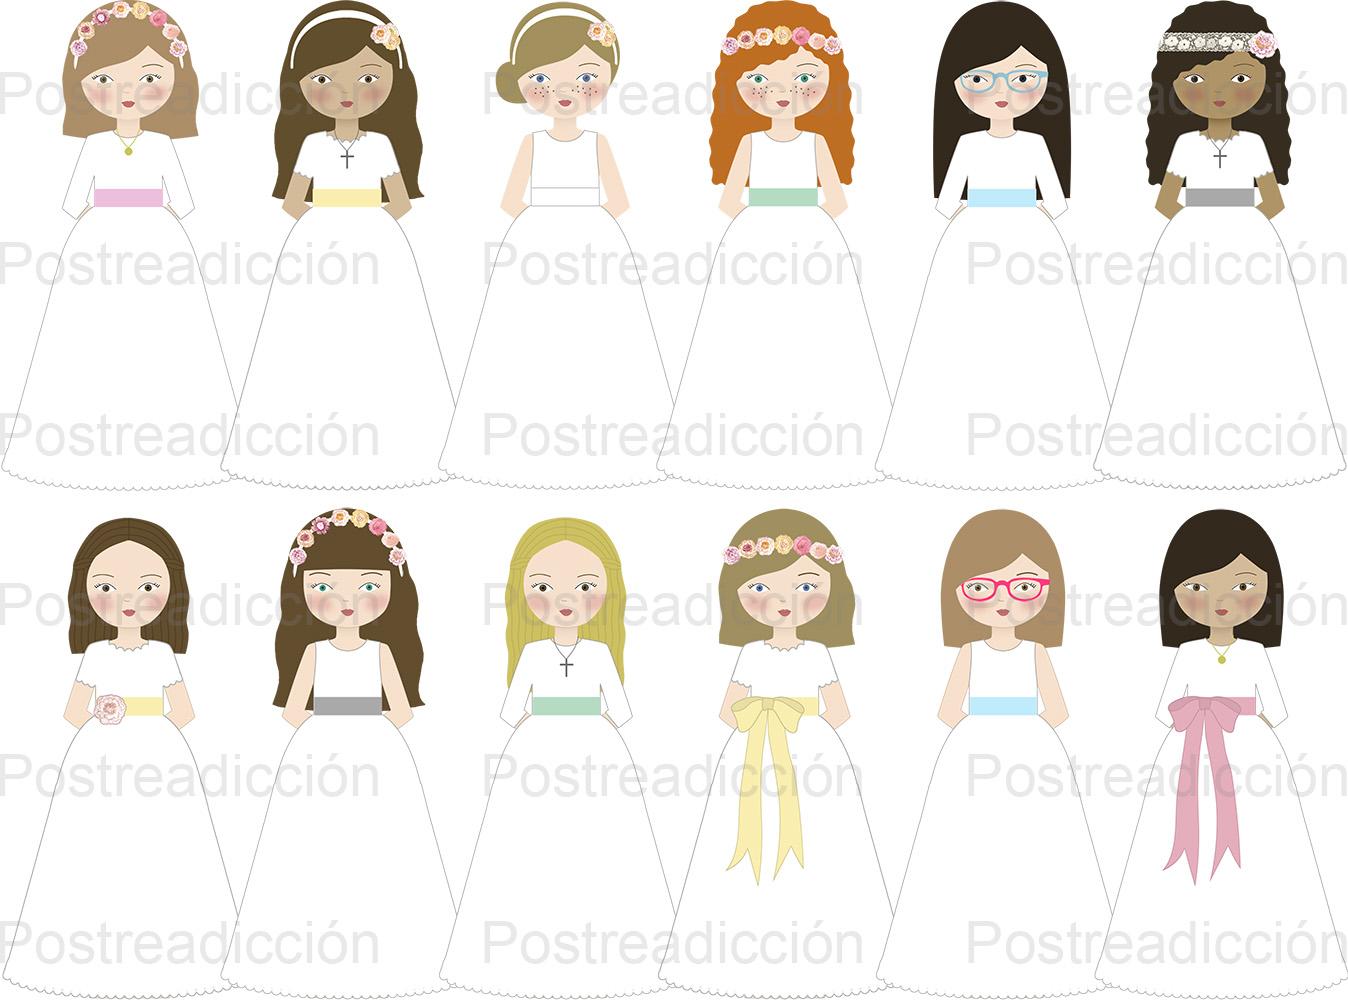 Imagen de producto: https://tienda.postreadiccion.com/img/articulos/secundarias4067-5-espejitos-de-comunion-carlota-modelo-no-532-1.jpg